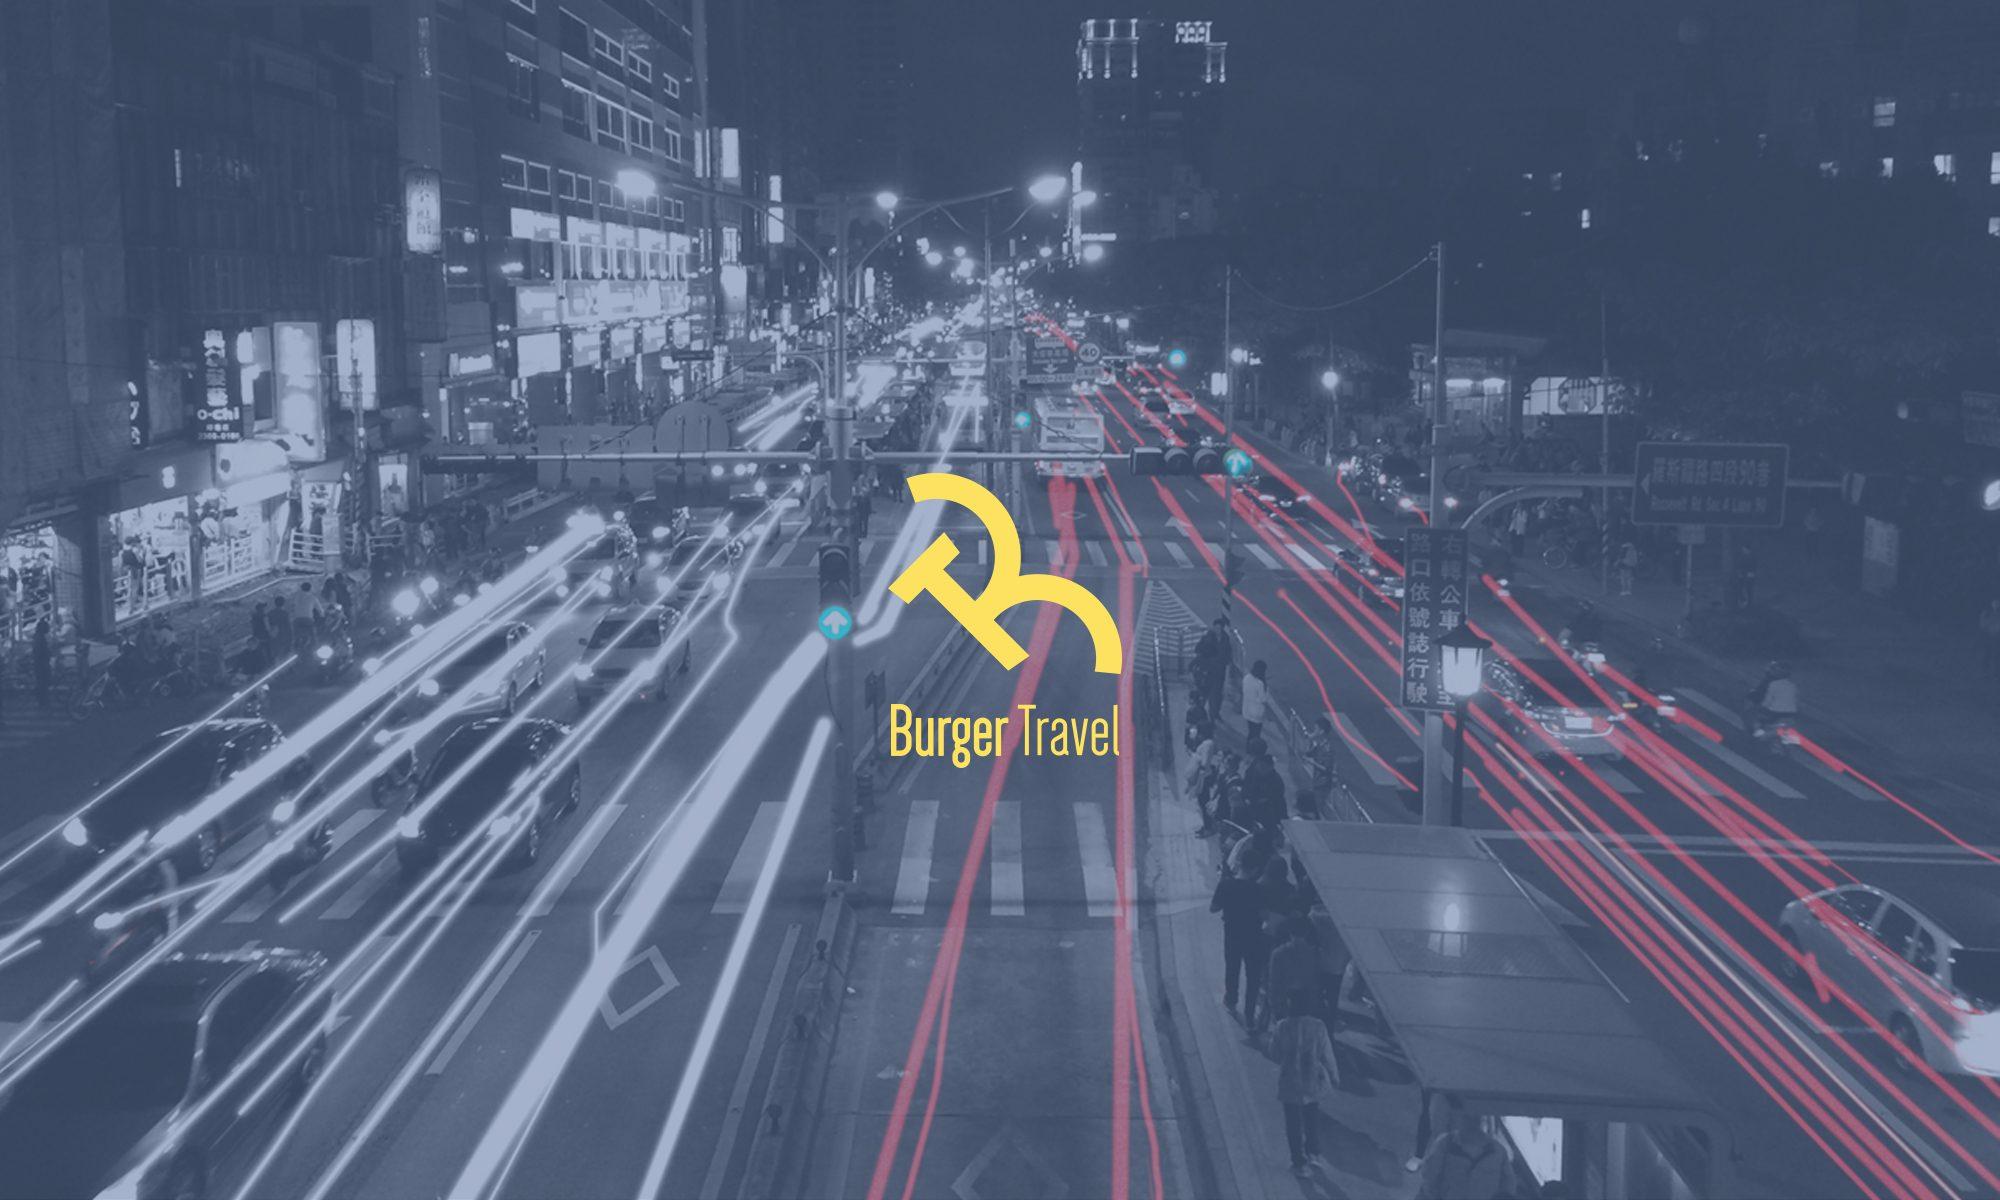 Burger Travel